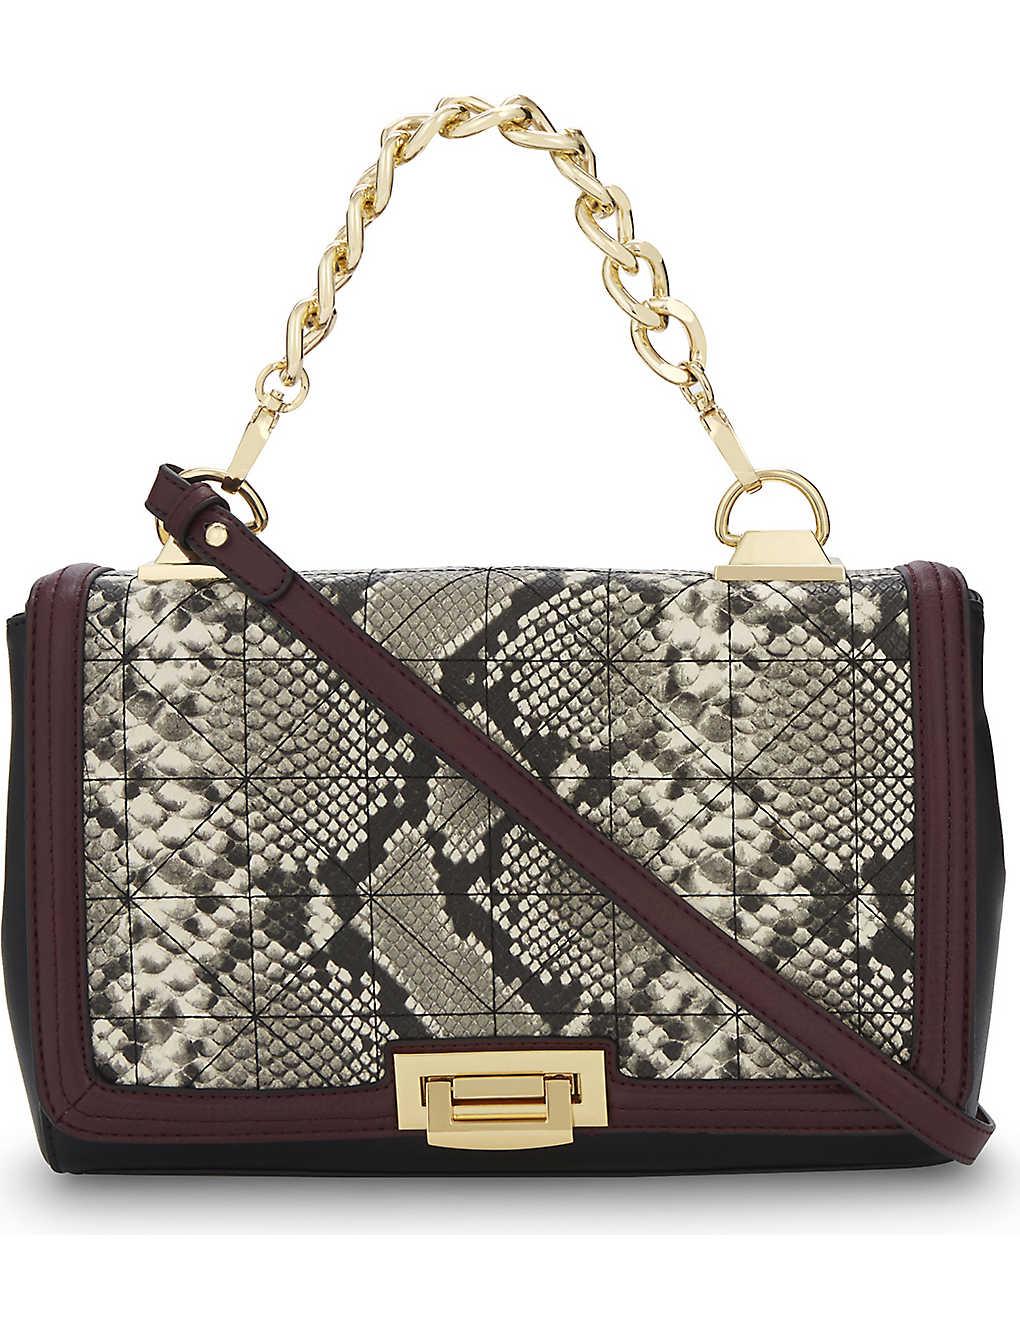 a1e075e3769 ALDO - Cutigliano python-texture faux-leather messenger bag ...